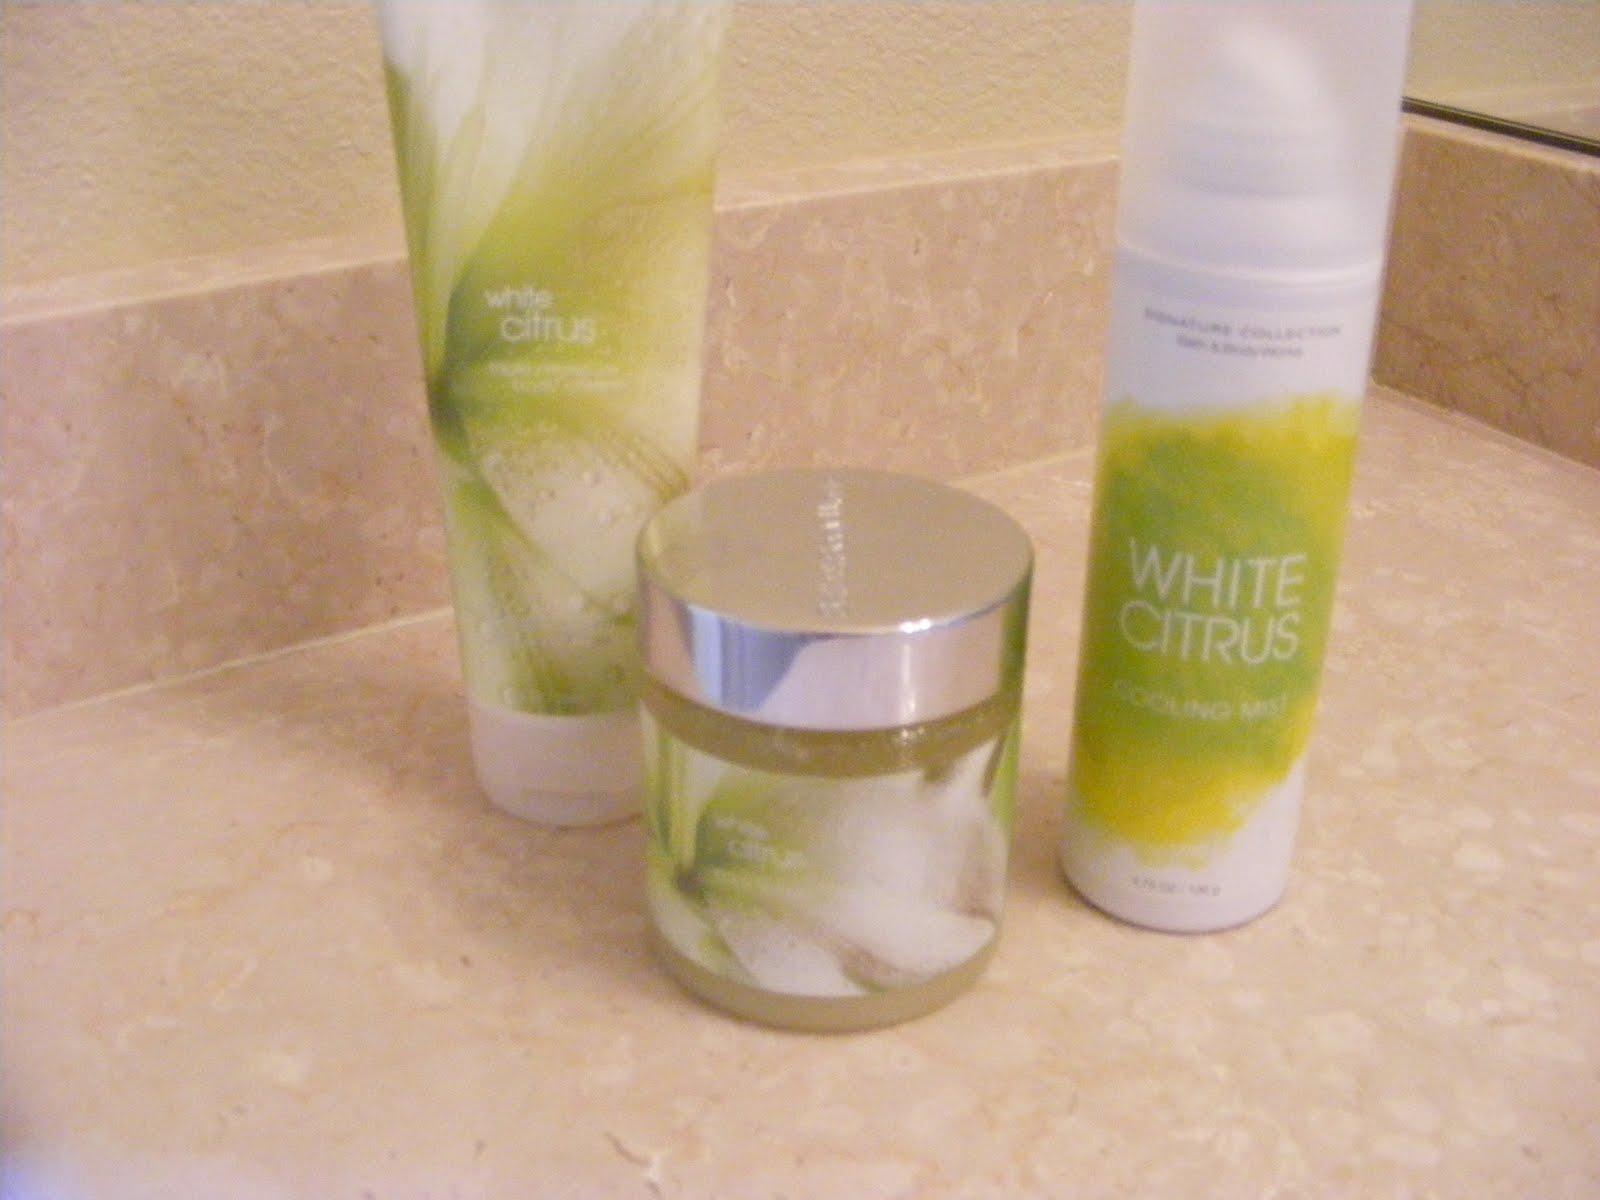 Bath And Body Works White Citrus Room Spray